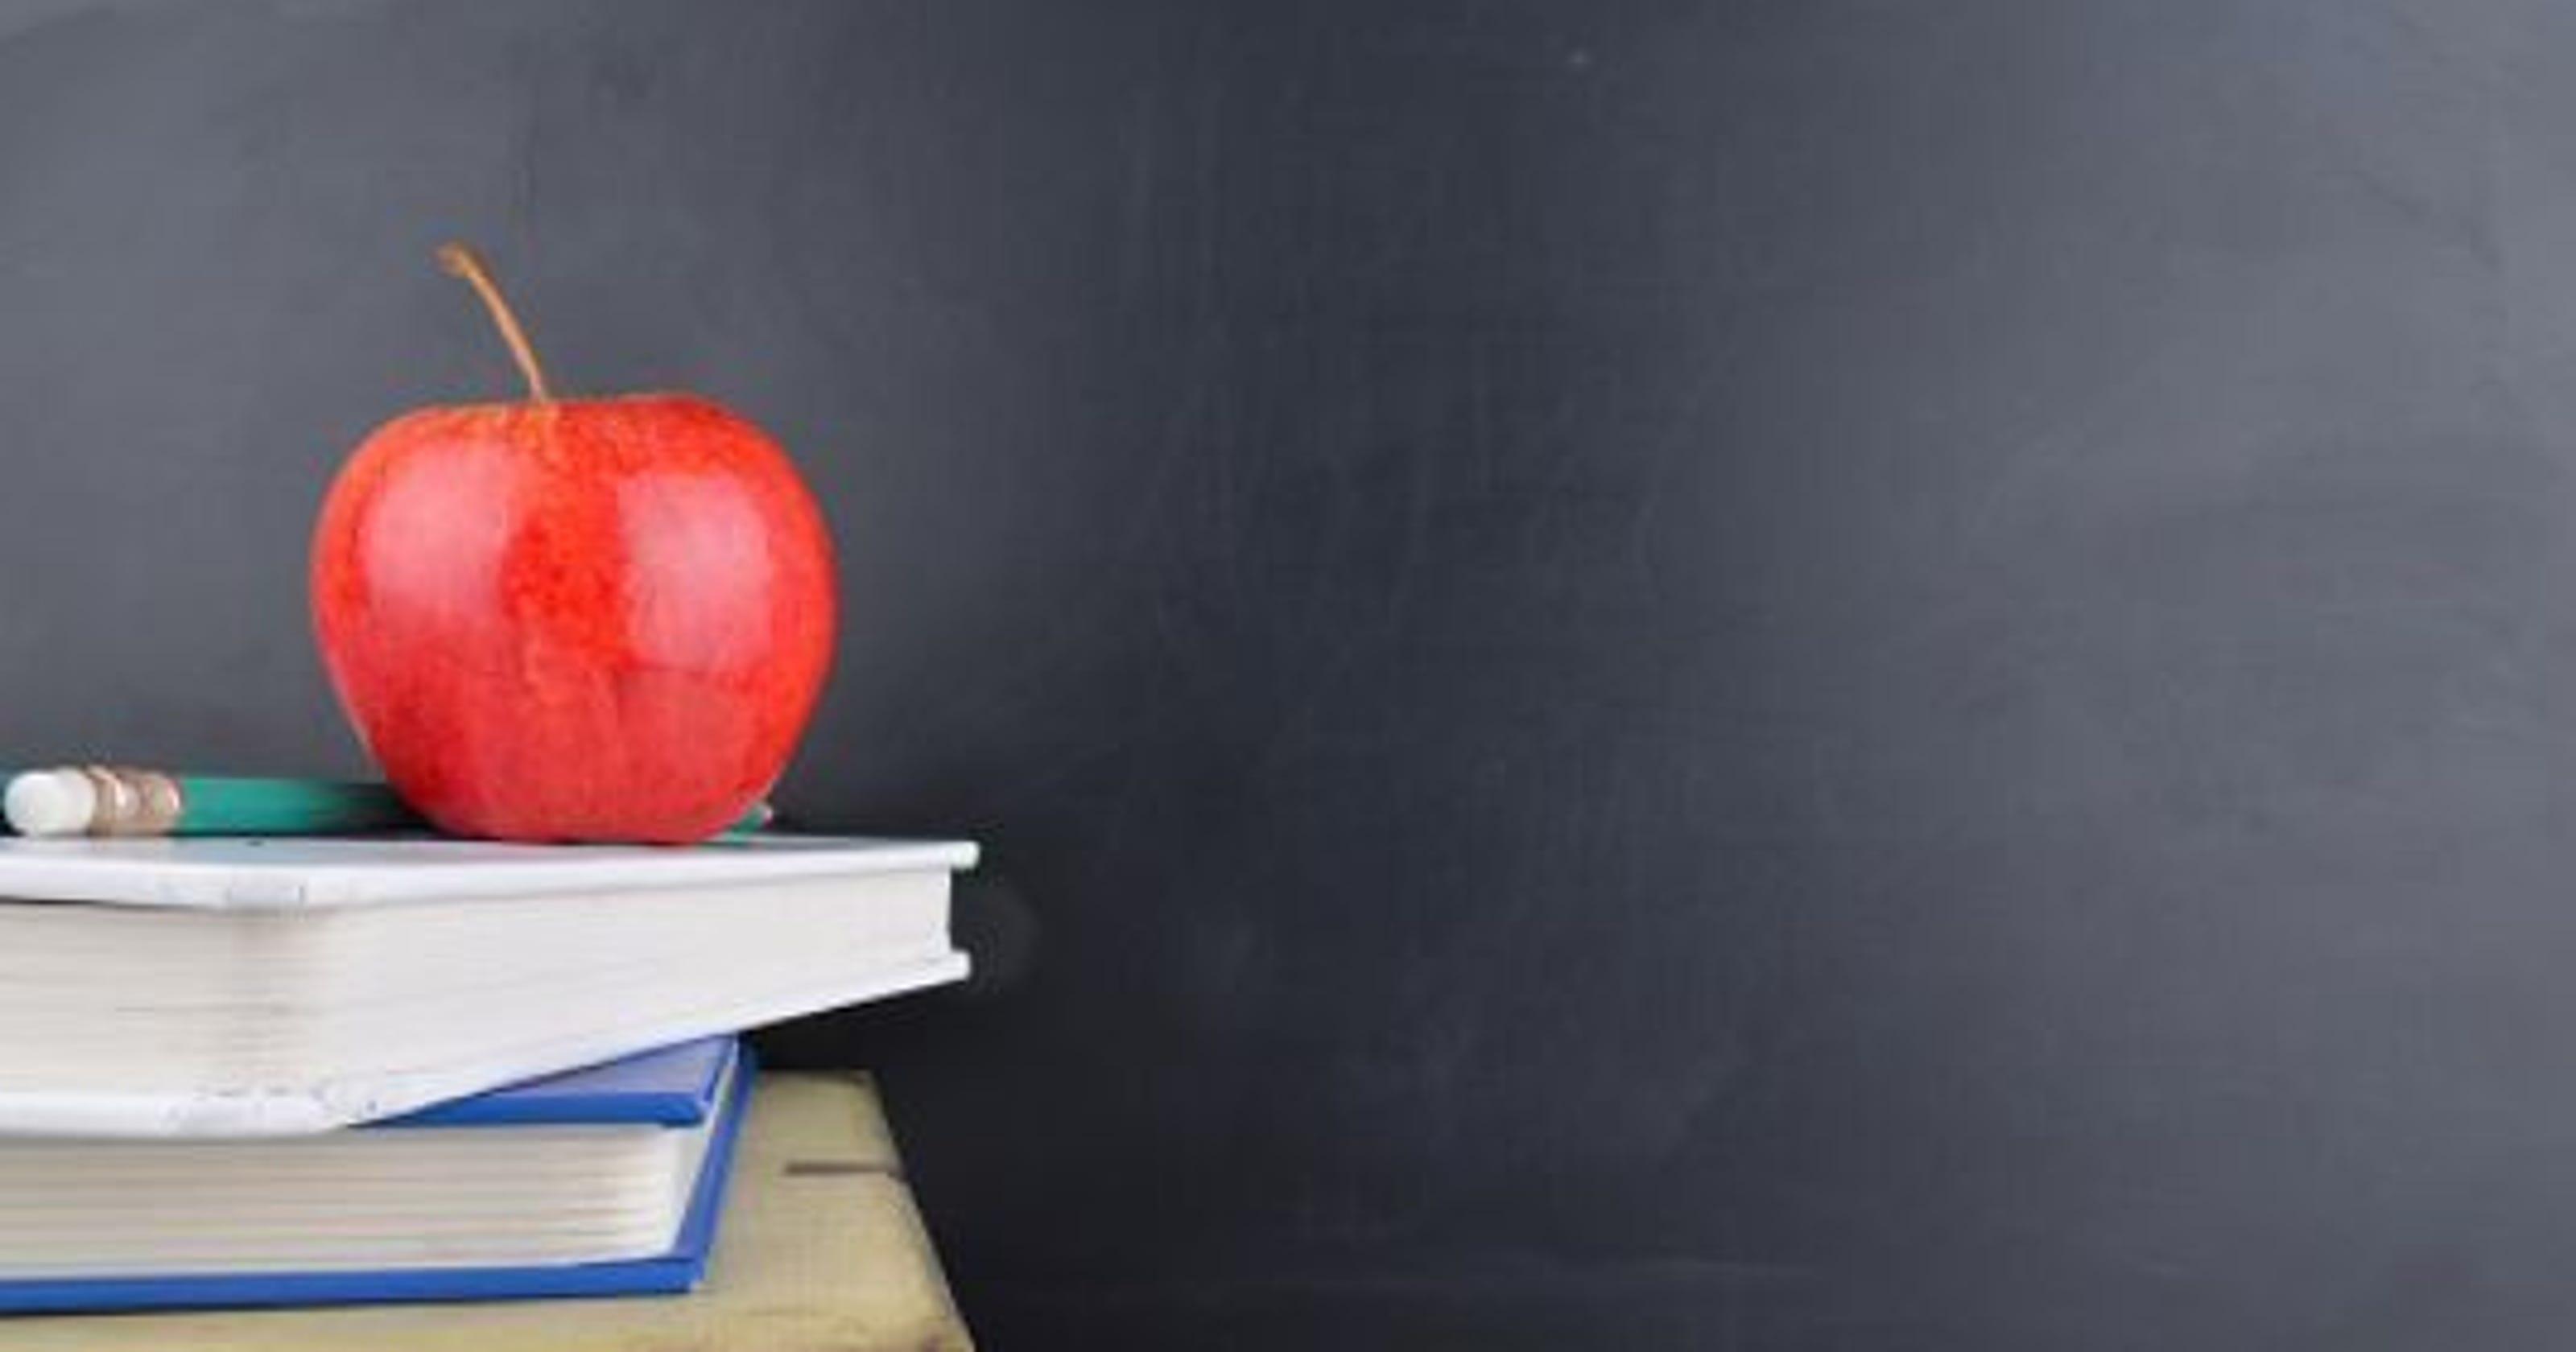 Pennsylvania teacher salaries 2016-17: Searchable pay information